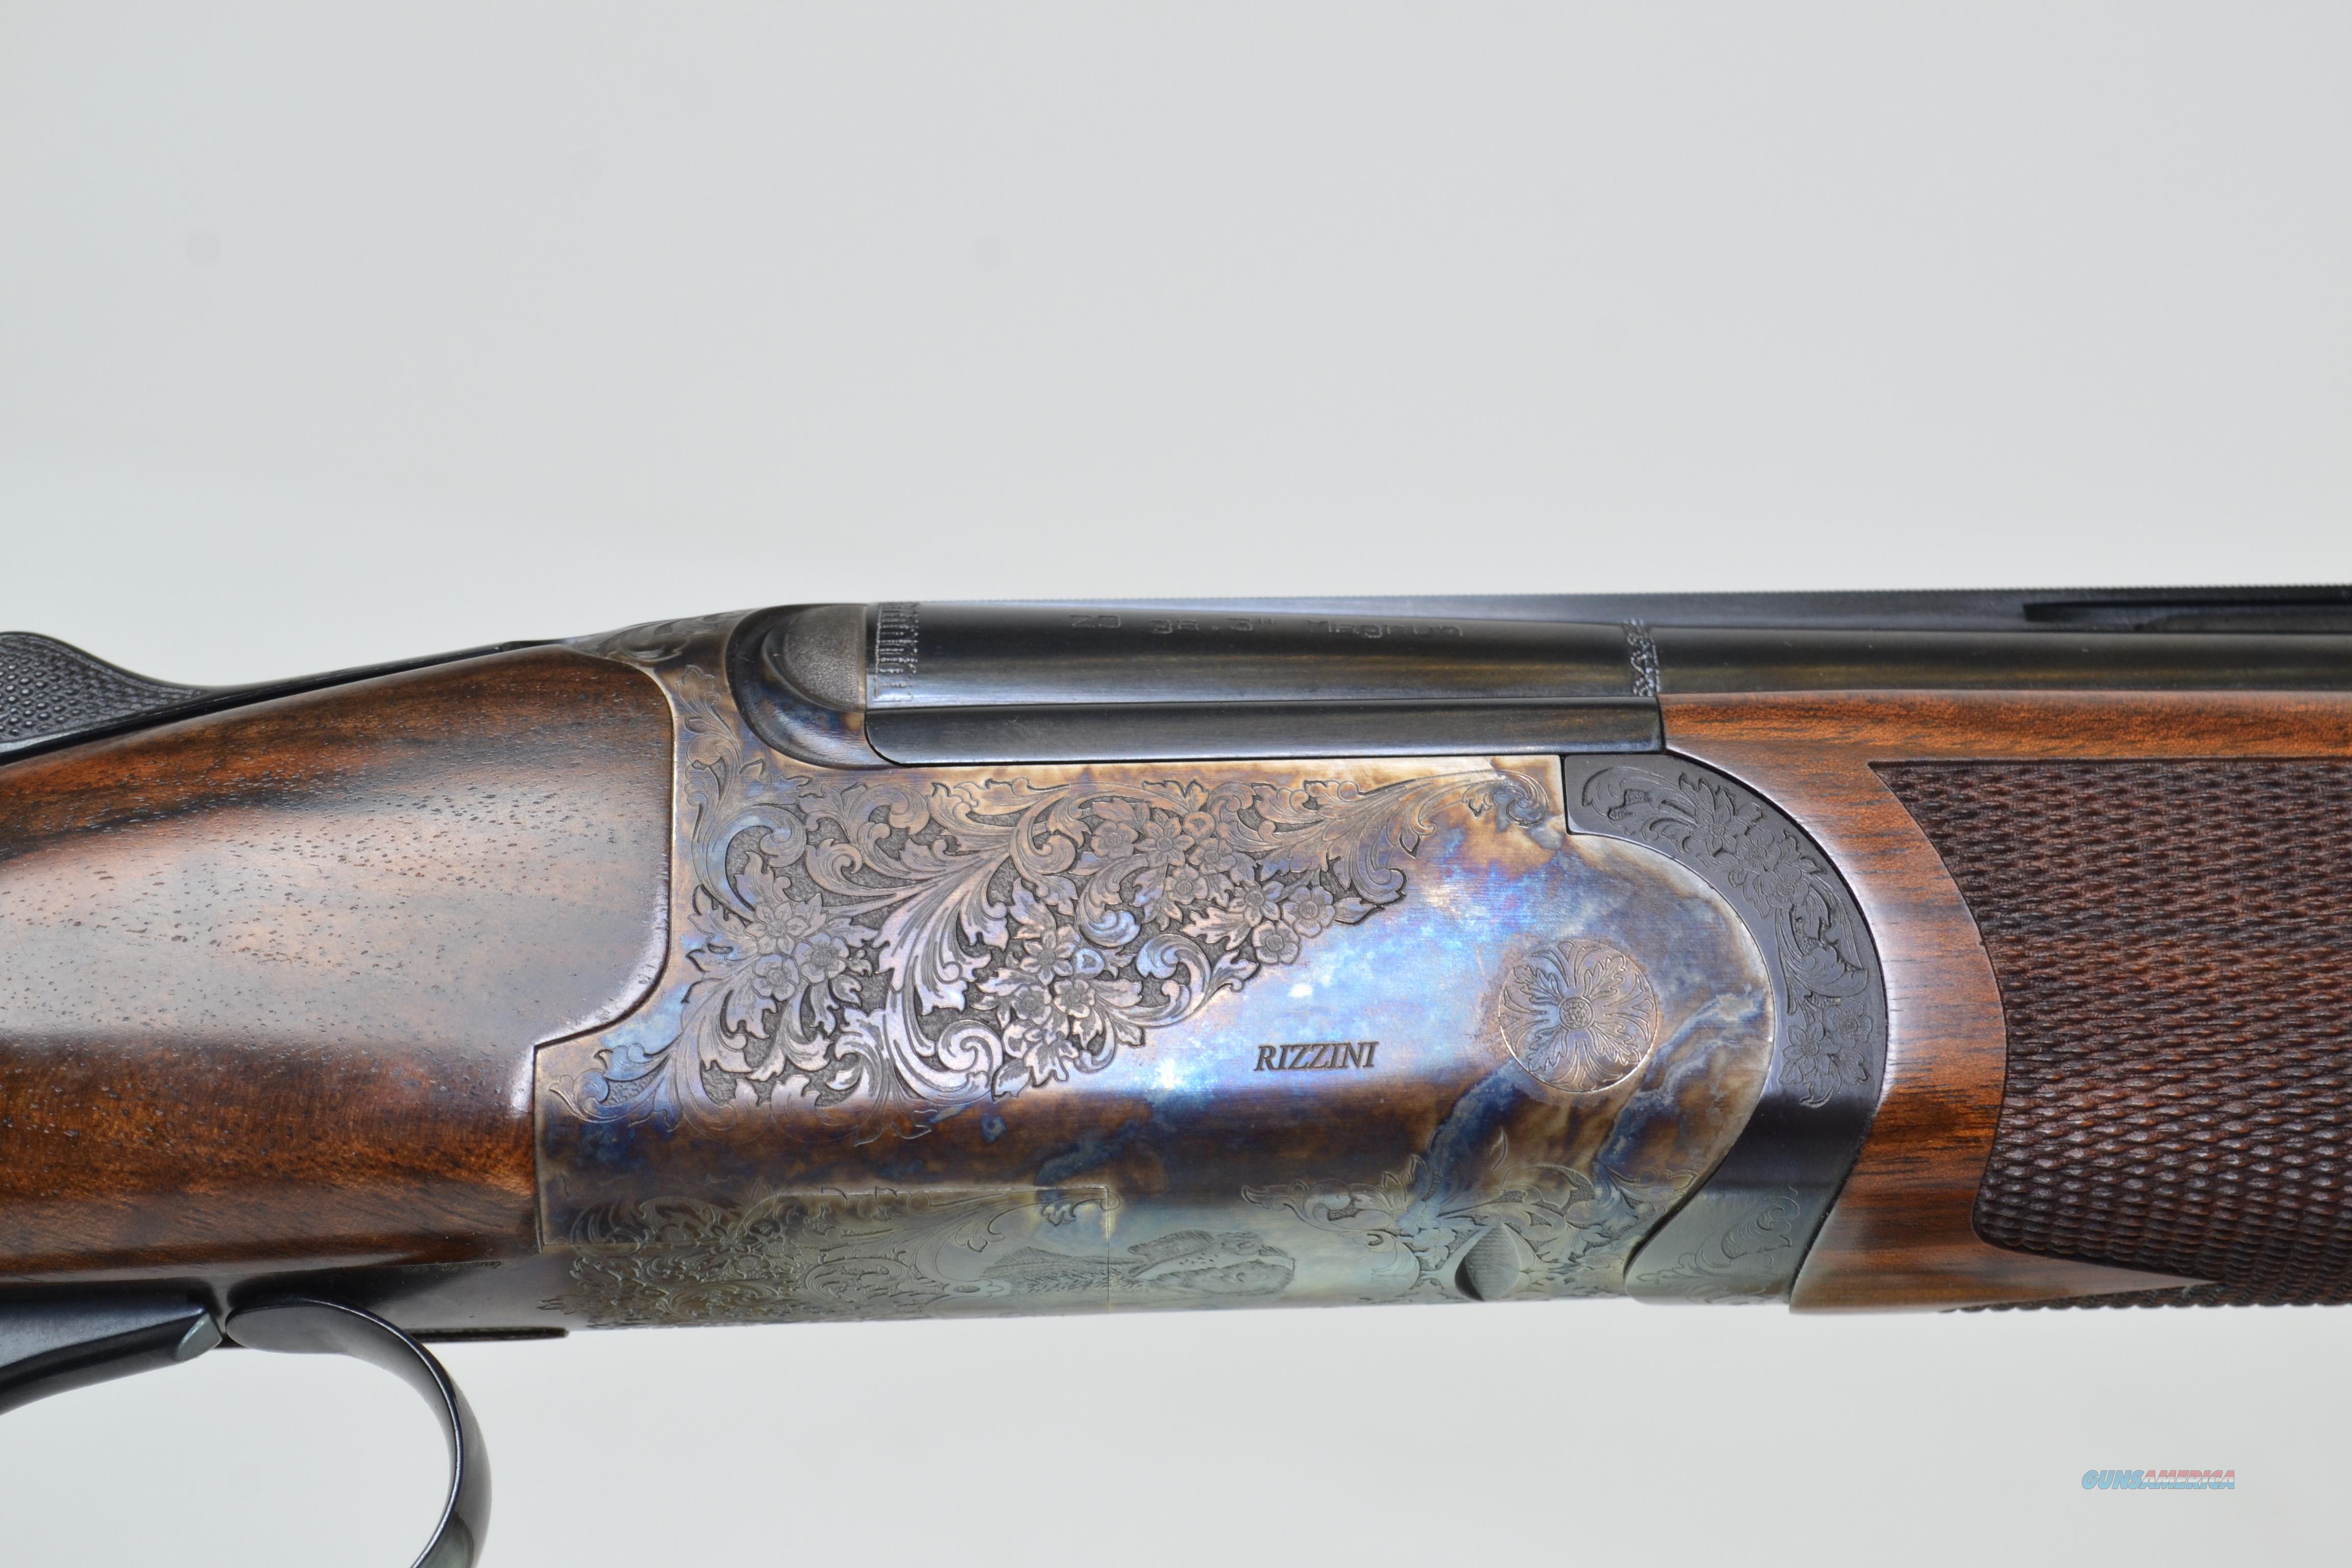 "B. Rizzini - Round Body EM, 20ga. 28"" Barrels with Screw In Chokes. #16248  Guns > Shotguns > Rizzini Shotguns"